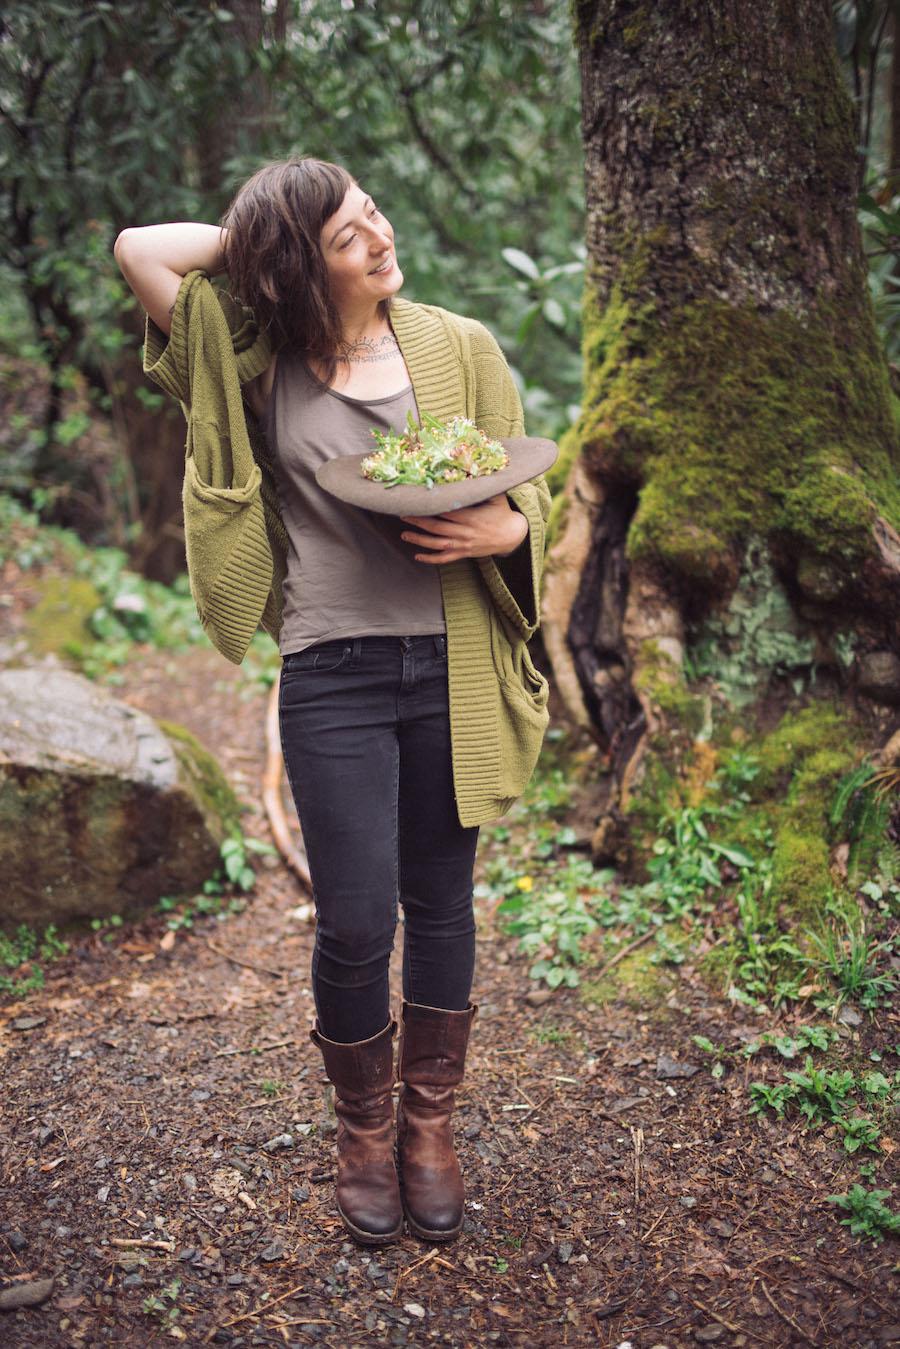 Shea Olinger - Massage therapist, healing arts practitioner